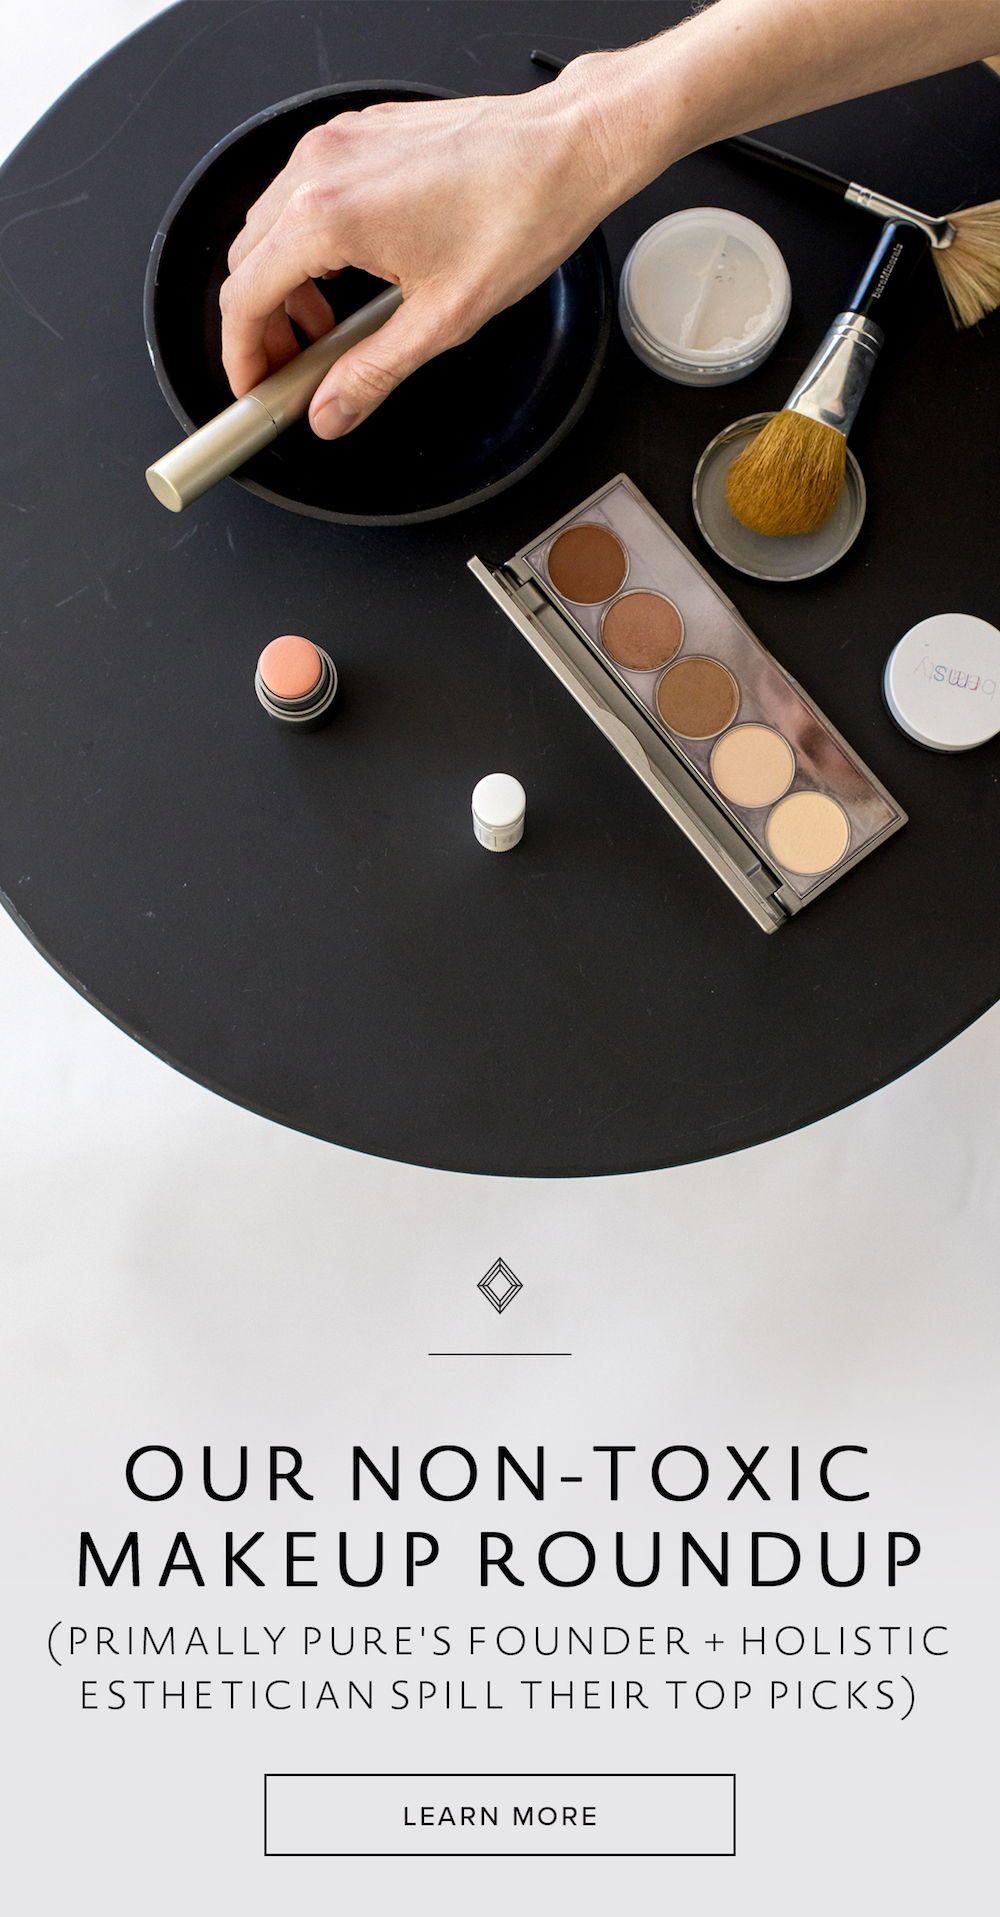 NonToxic Makeup Roundup (Plus 5 Pro Makeup Hacks) in 2020